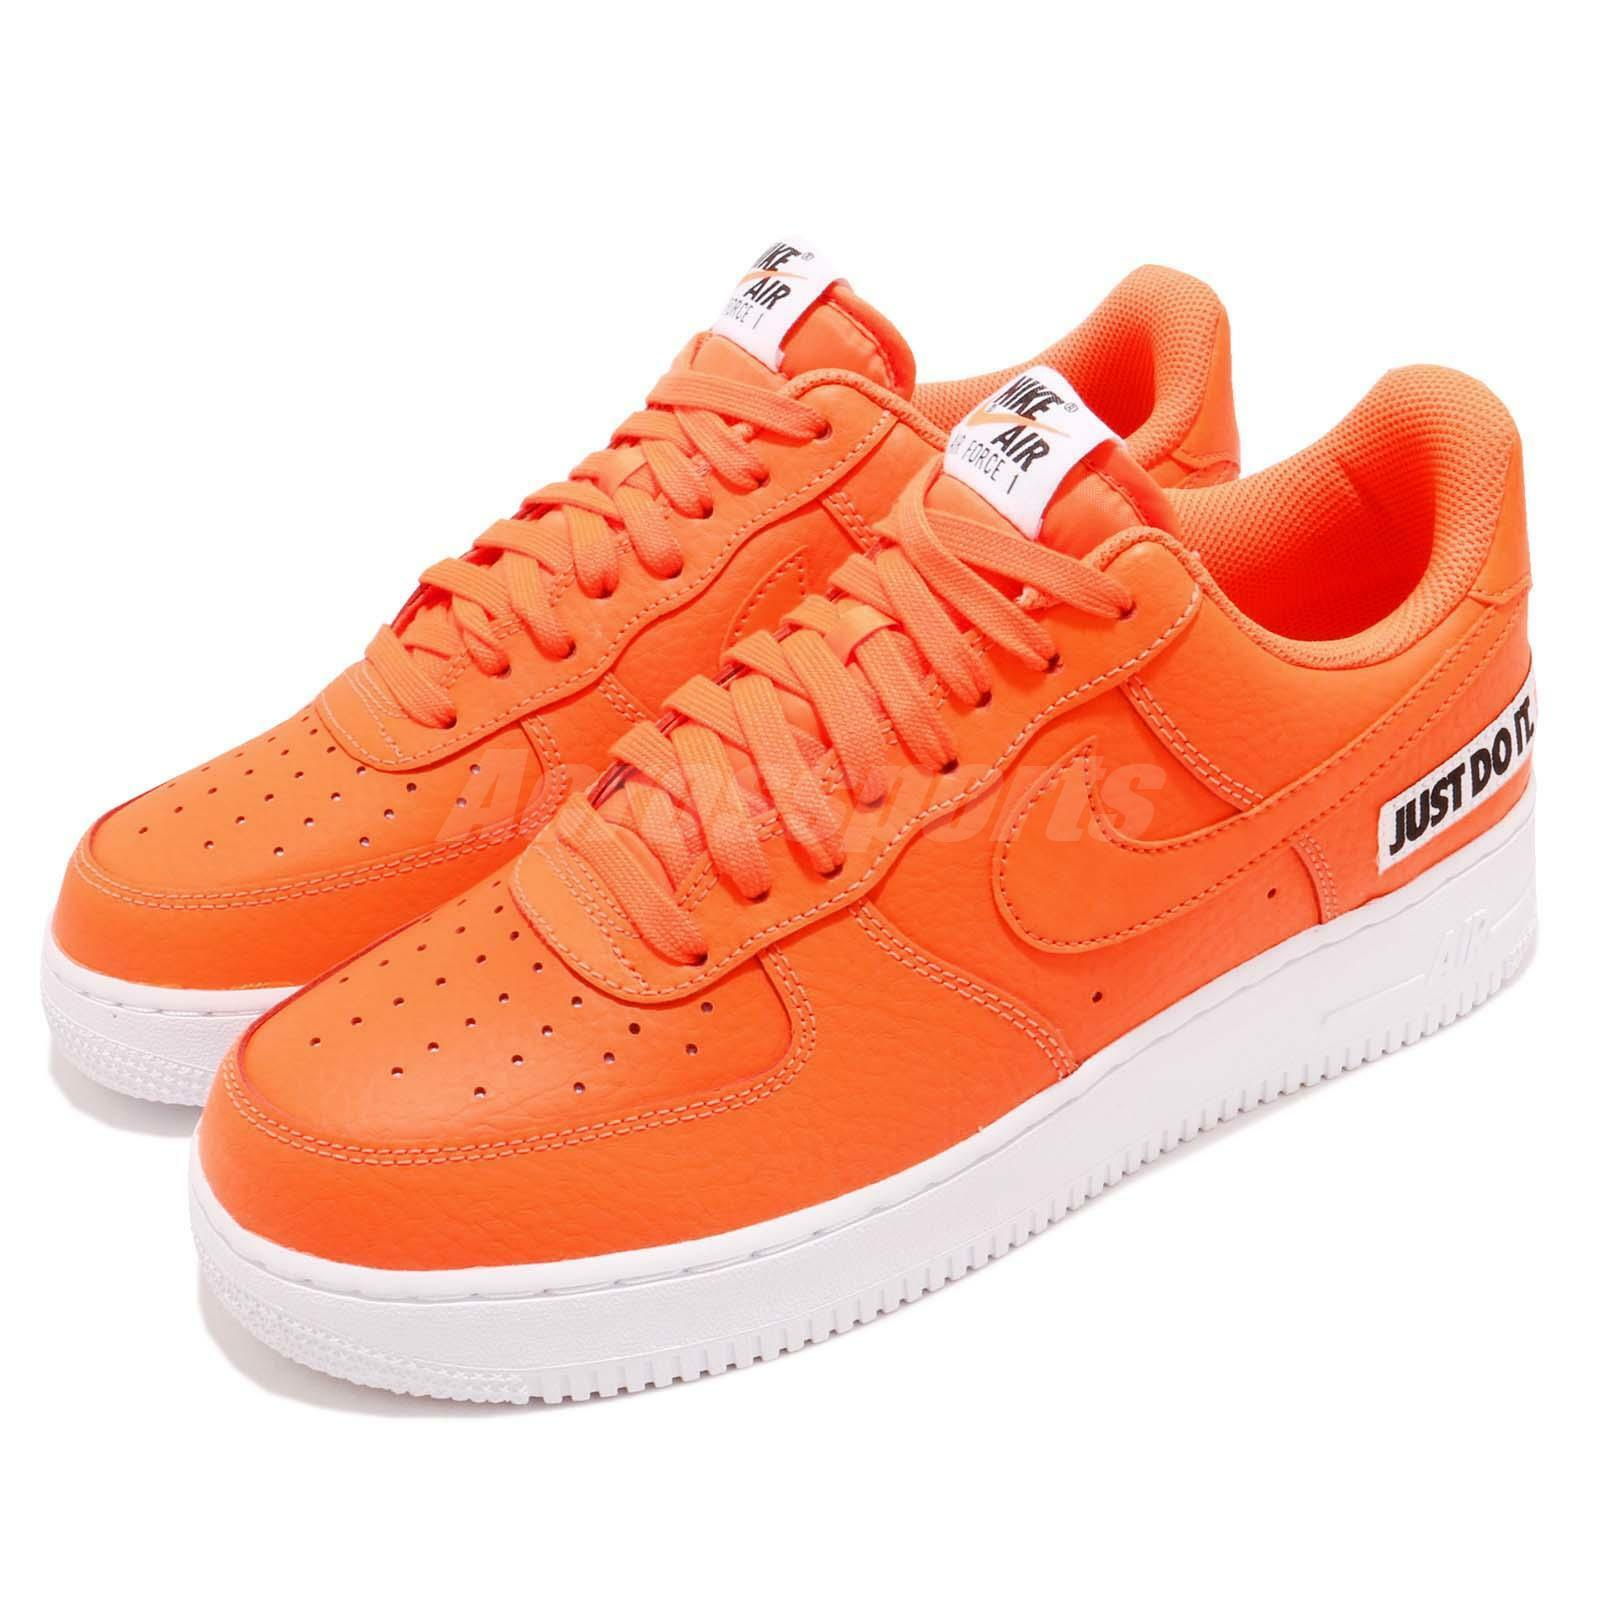 more photos c64f5 706ed Nike Nike Nike Air Force 1 07 LV8 JDI LTHR Just Do It Leather Orange  Sneakers BQ5360-800 cf2652